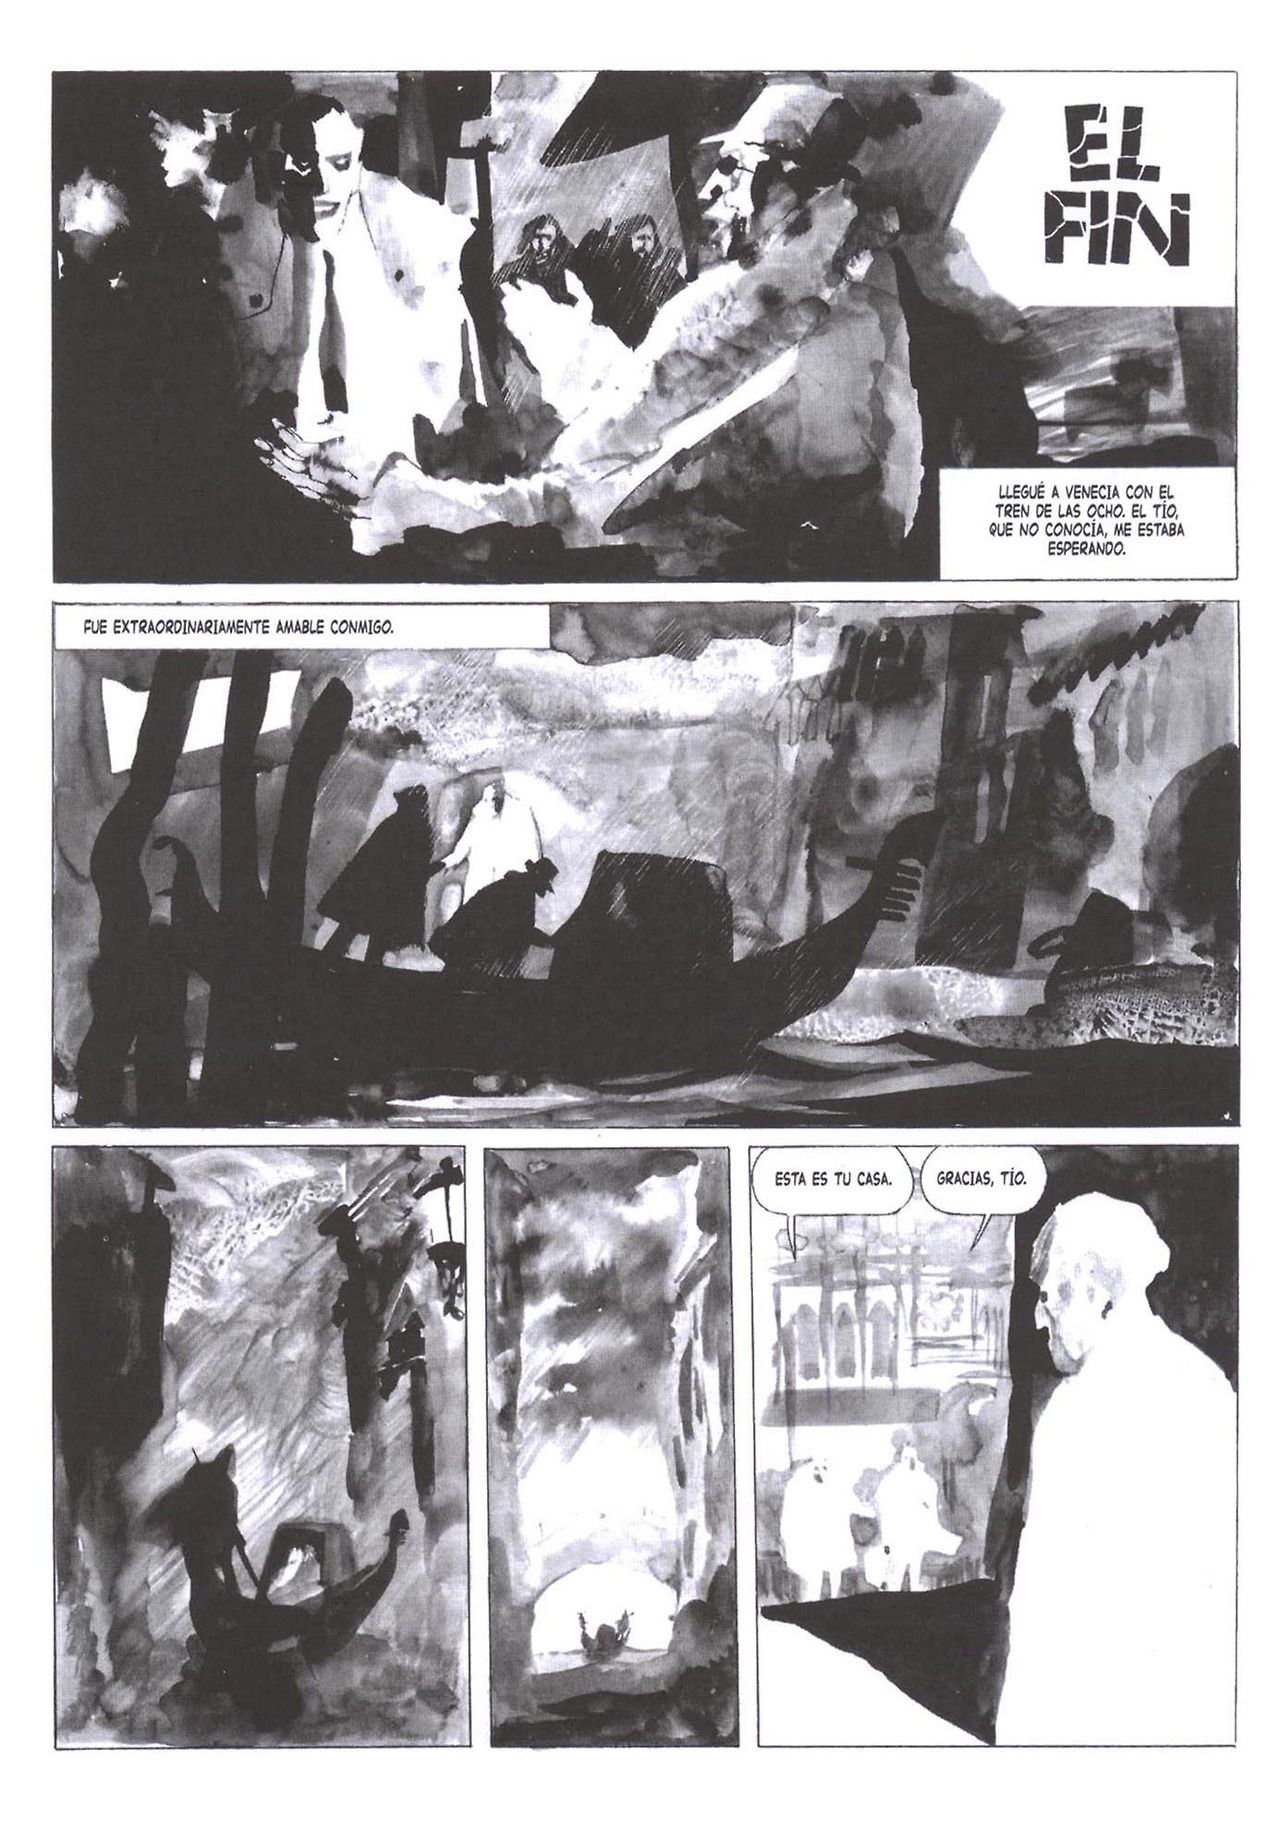 El Aire - Alberto Breccia (7) - Such a unique style. Part traditional ink, part collage.